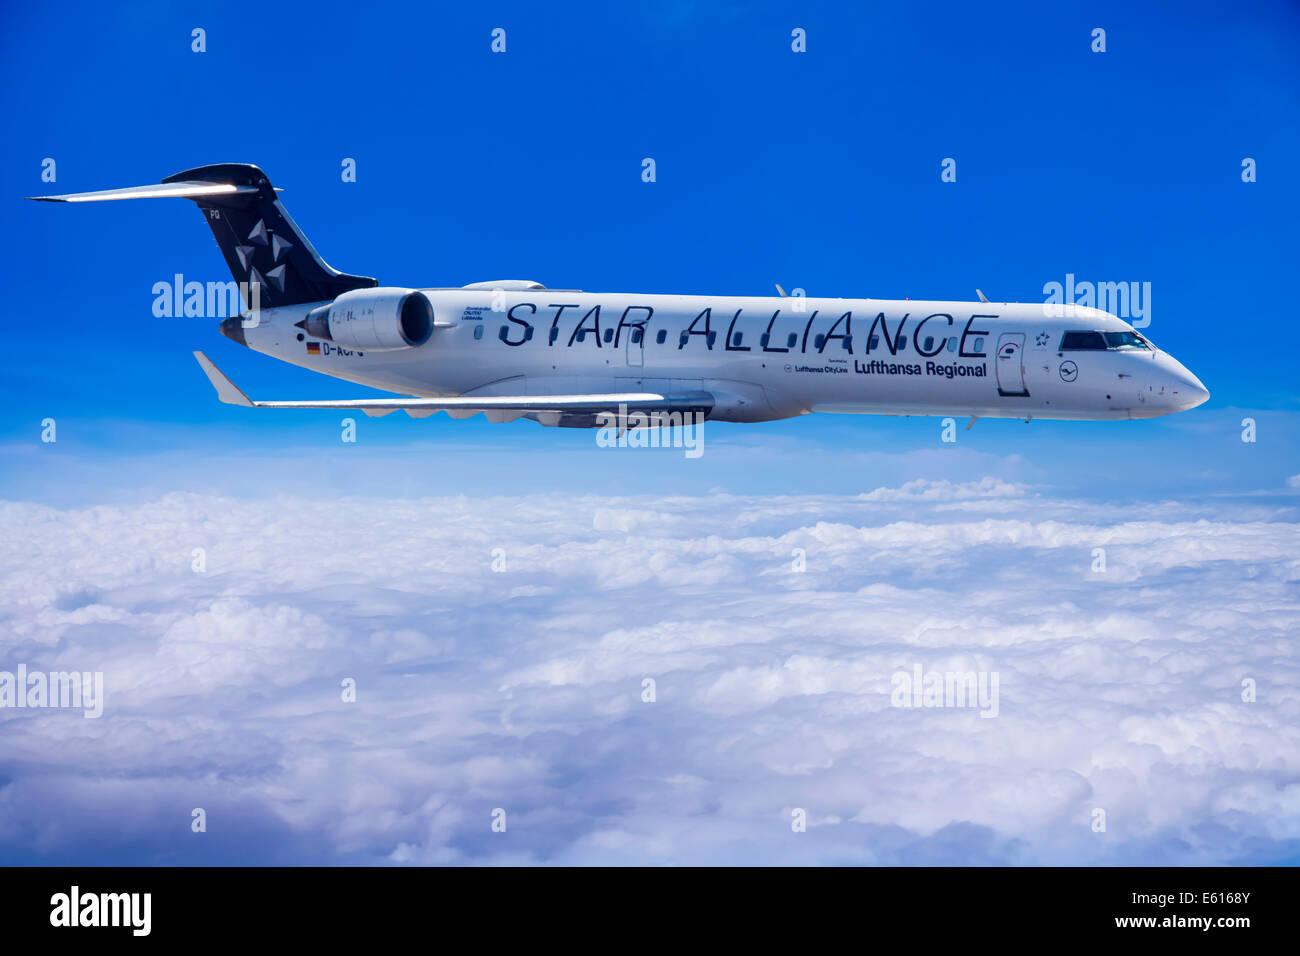 Star Alliance, Bombardier CRJ 700 aircraft, in flight - Stock Image